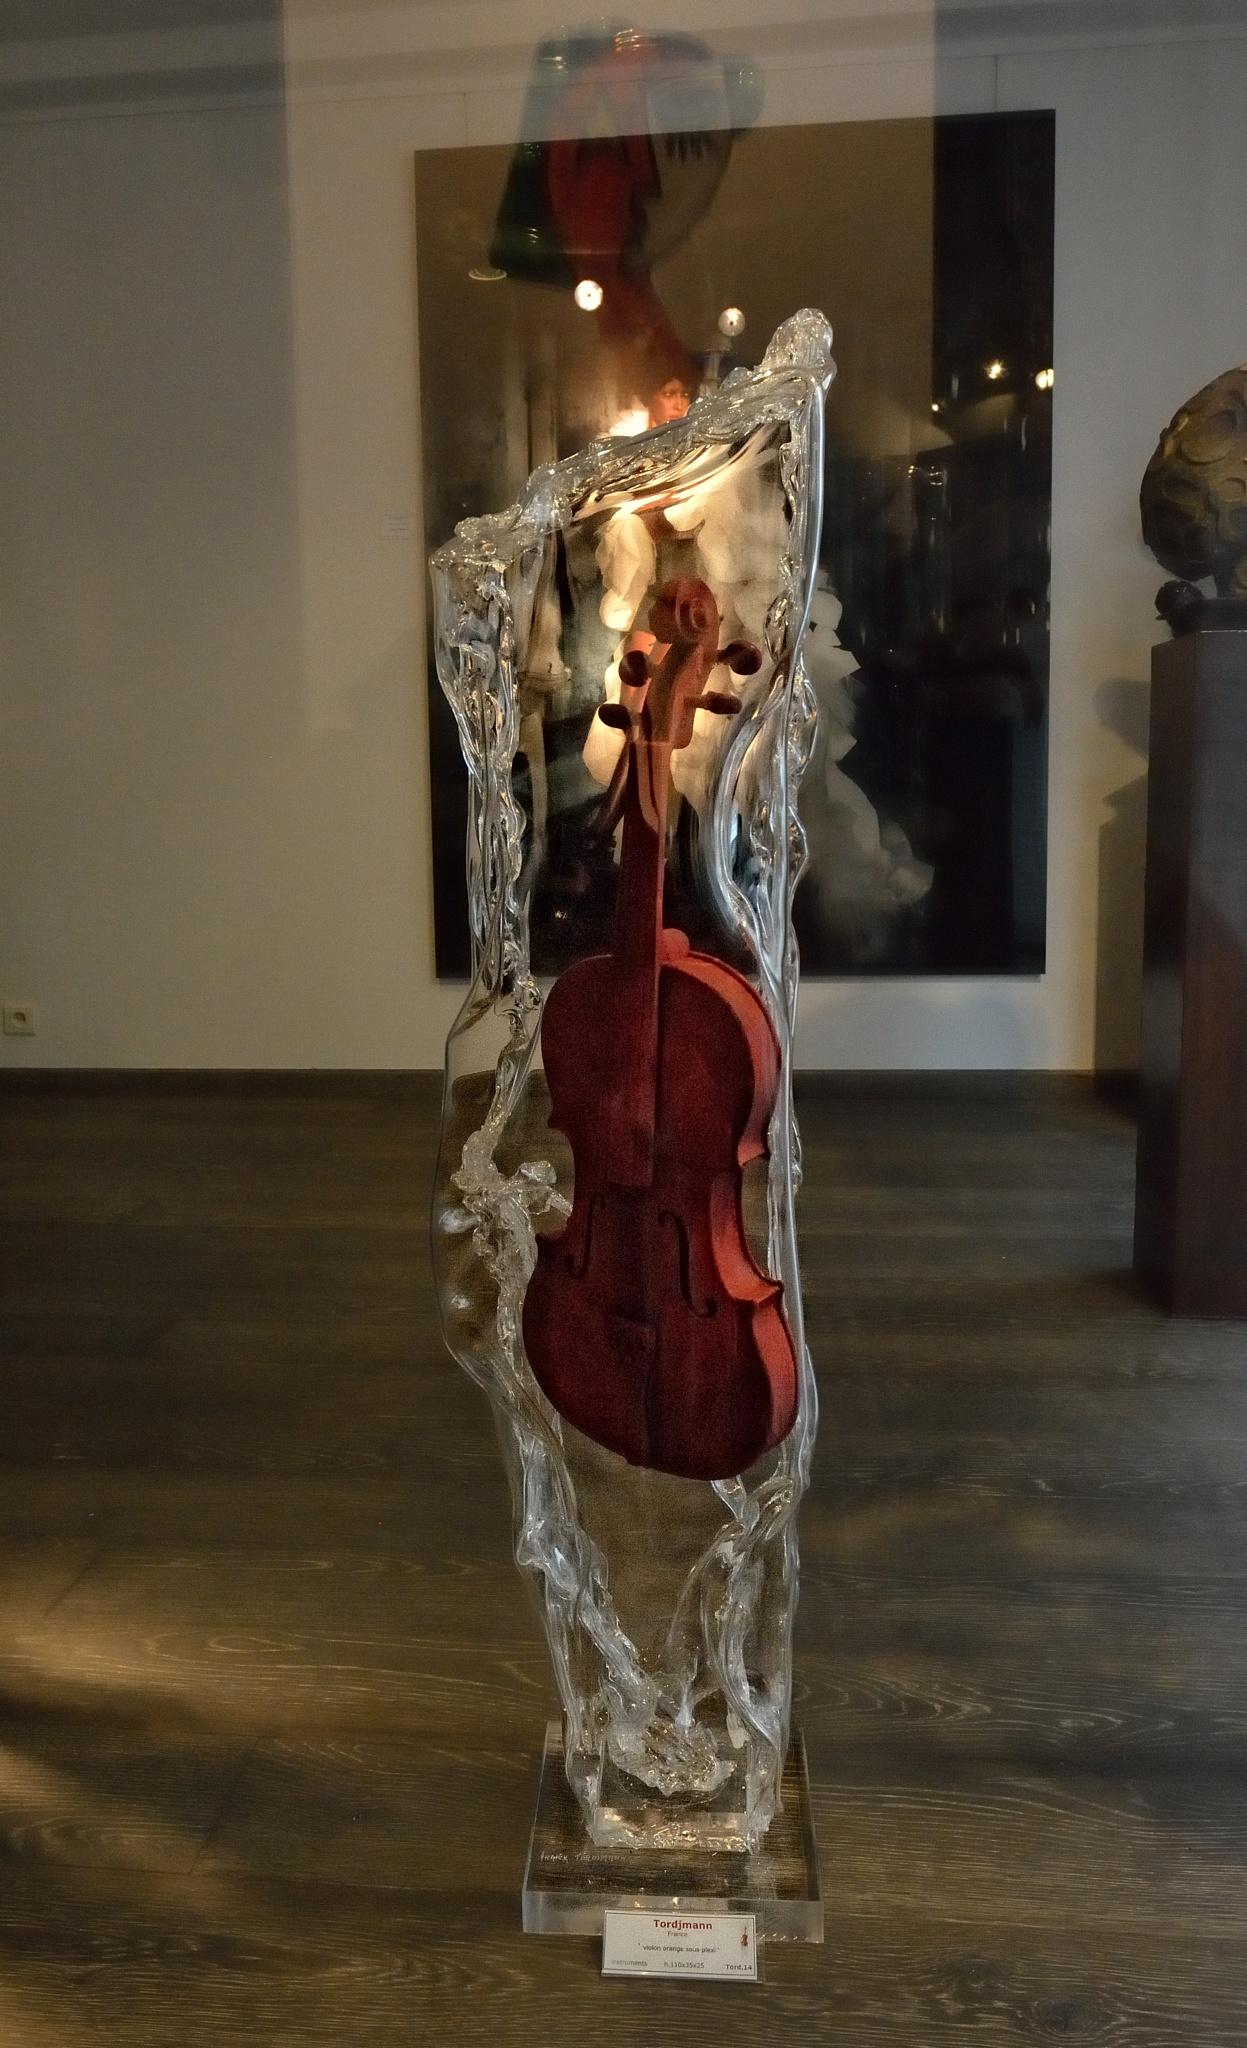 violin in Epoxy by Pozofolio